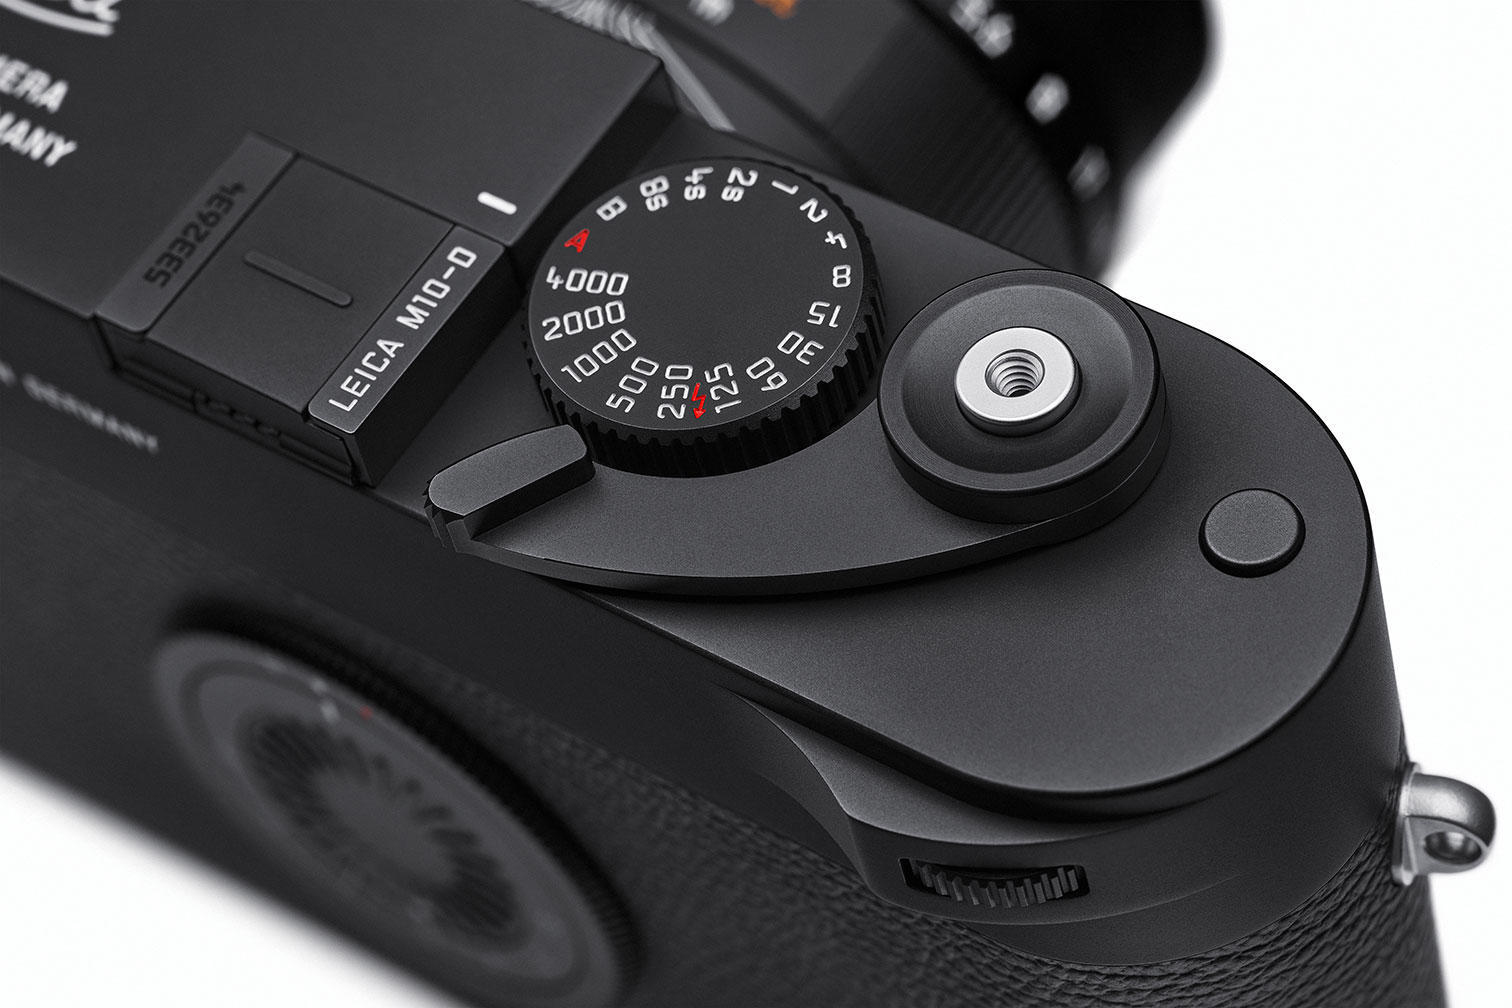 Foto: Leica